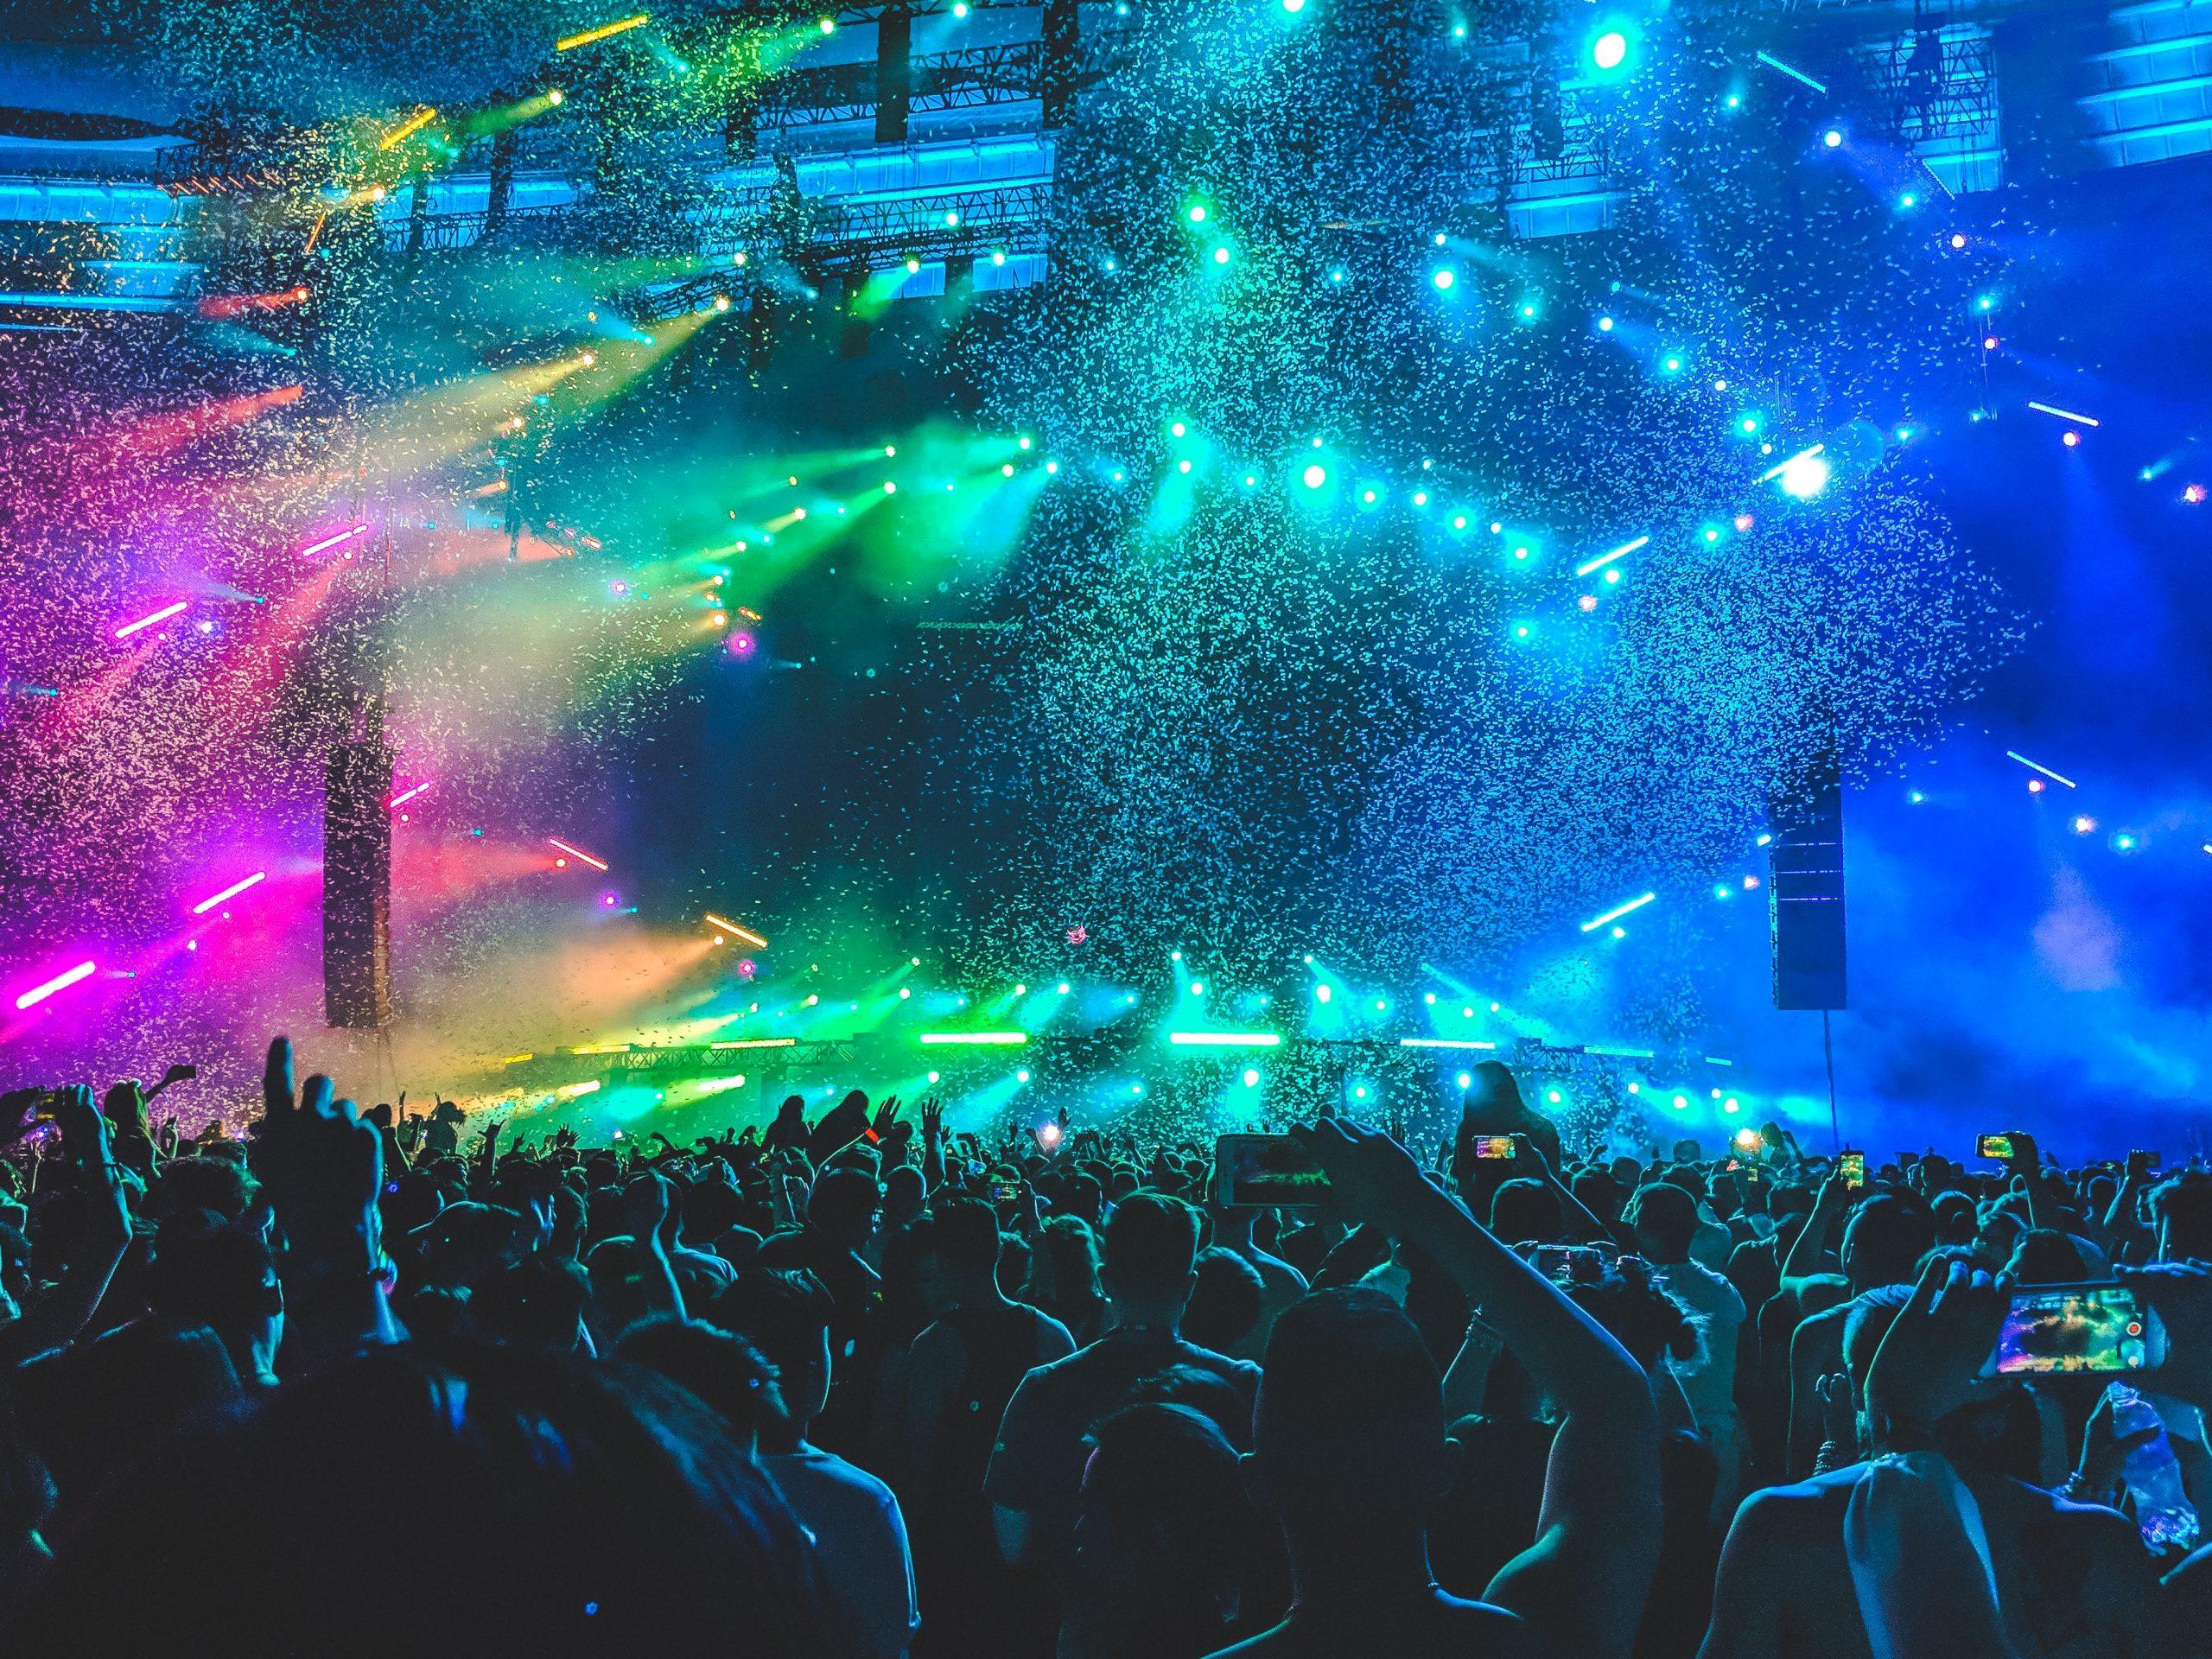 Gelar Konser Musik Dengan Prokes Ketat, 1.000 Orang Positif Covid-19!